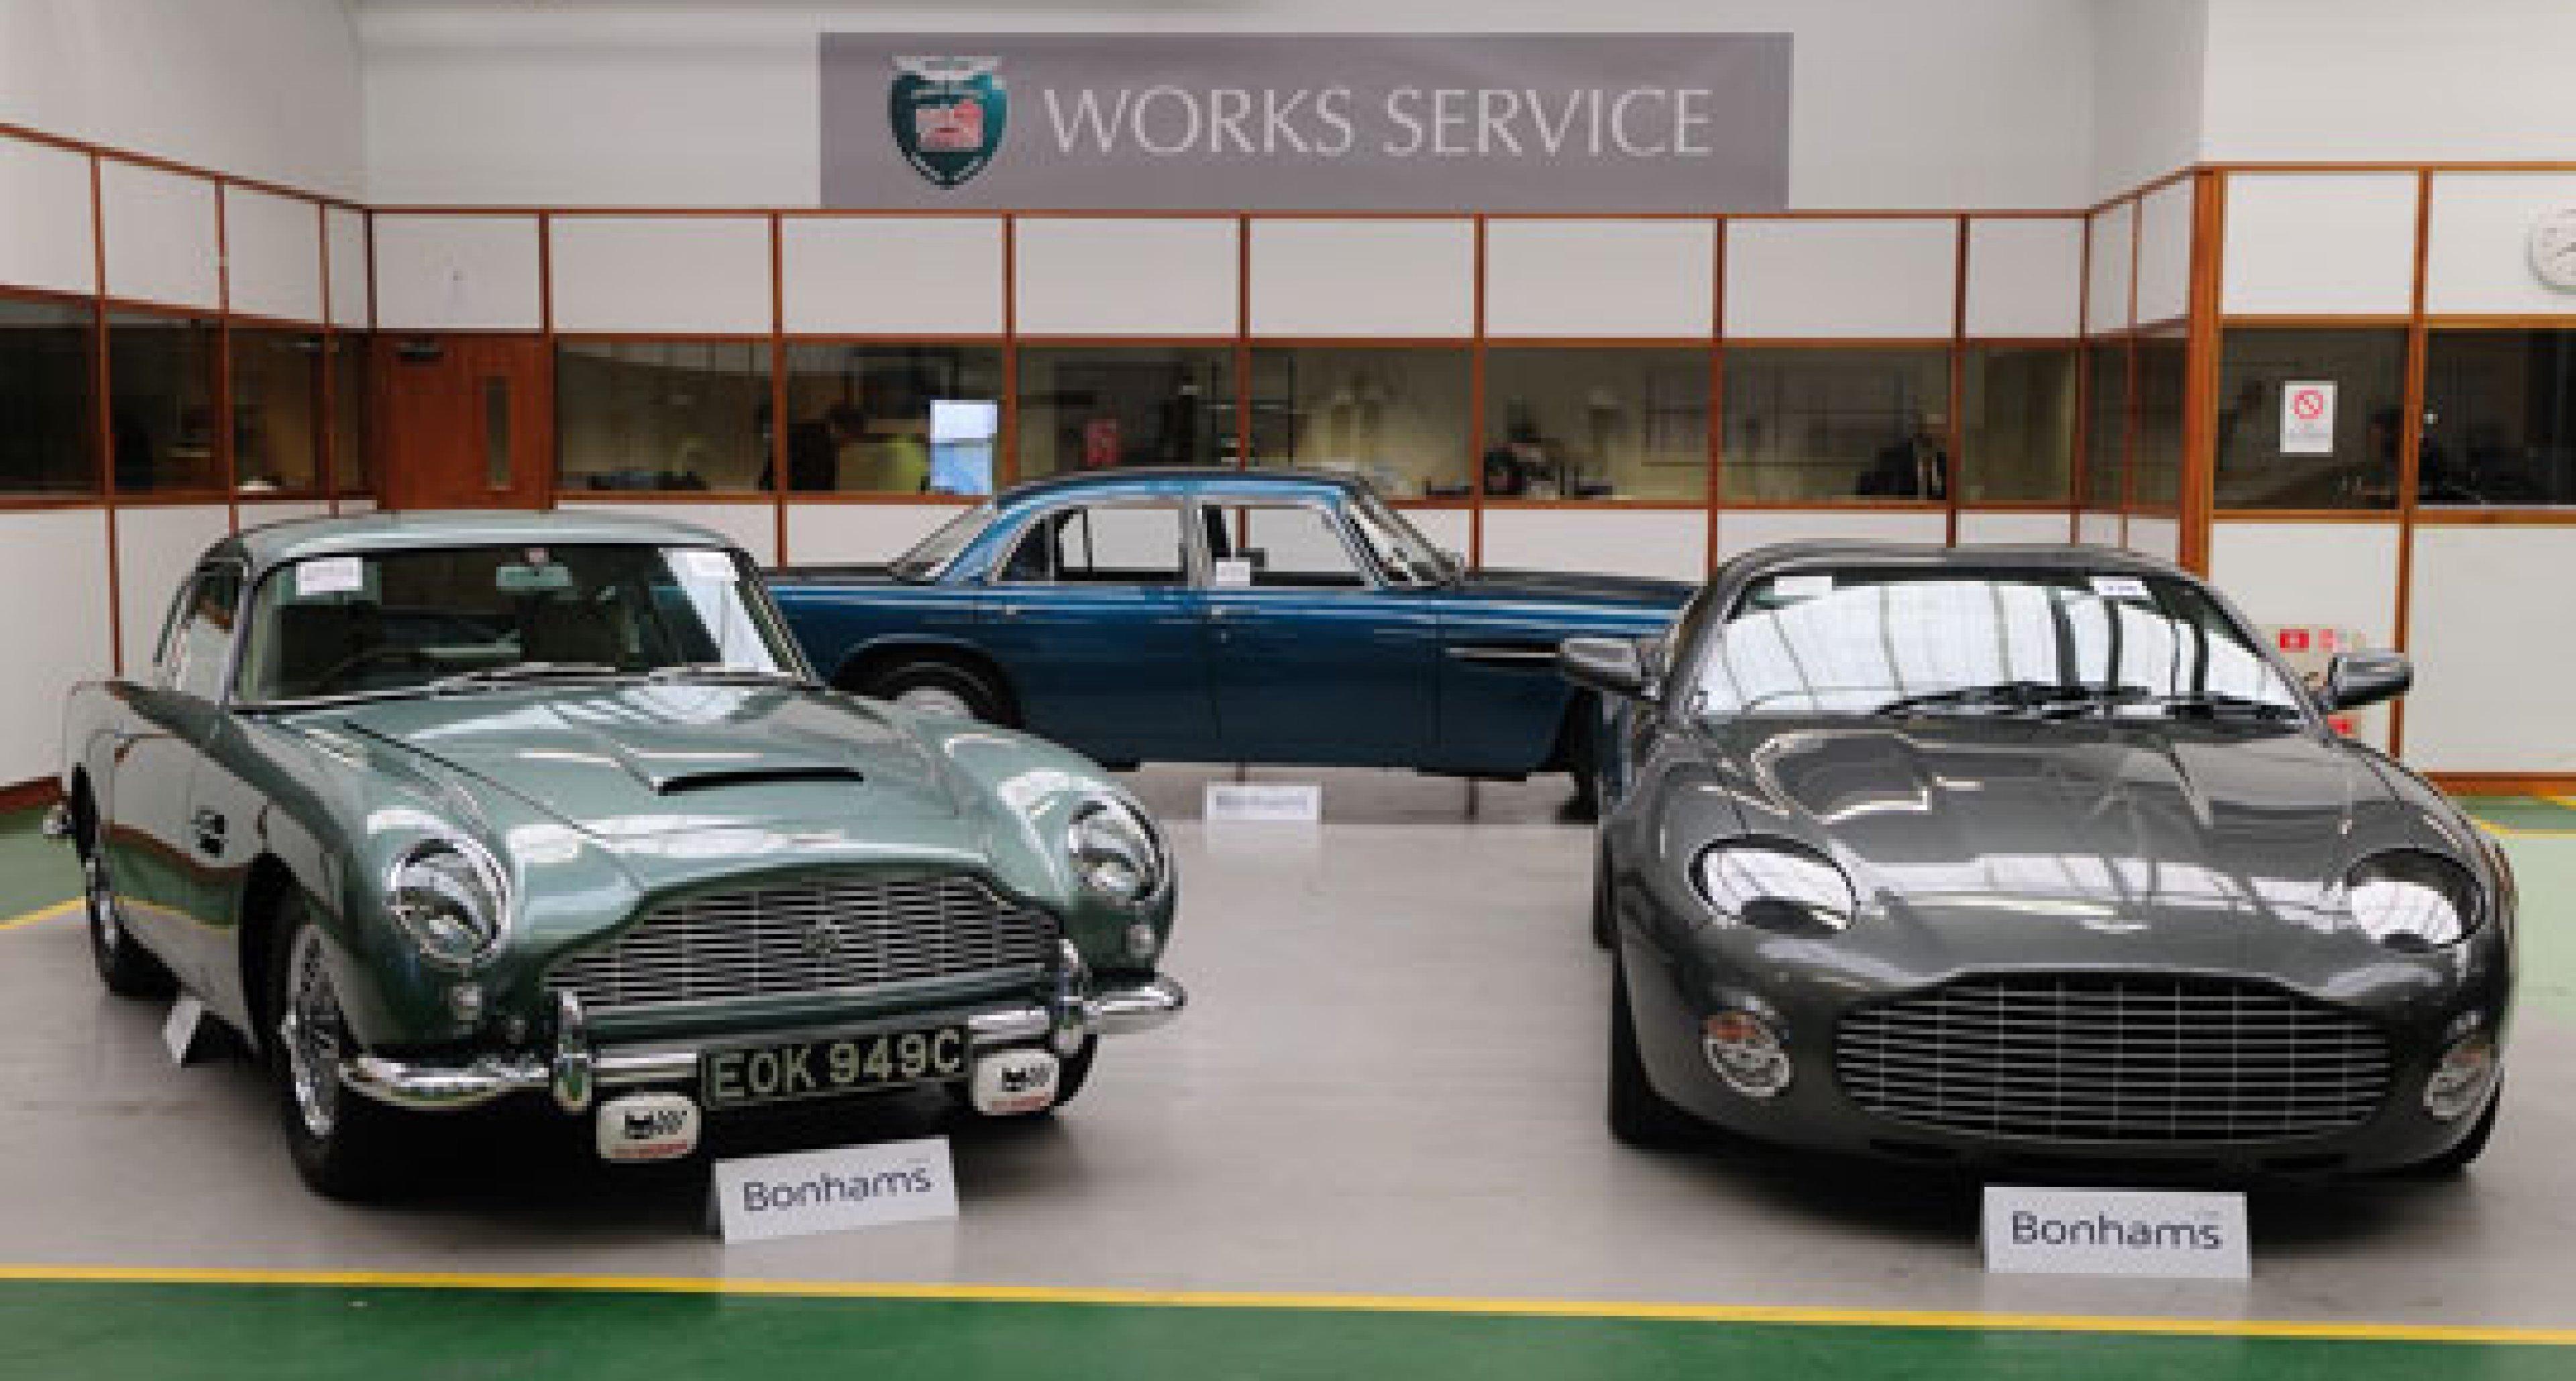 Bonhams Aston Martin Sale at Newport Pagnell -  9th May 2009 - Review